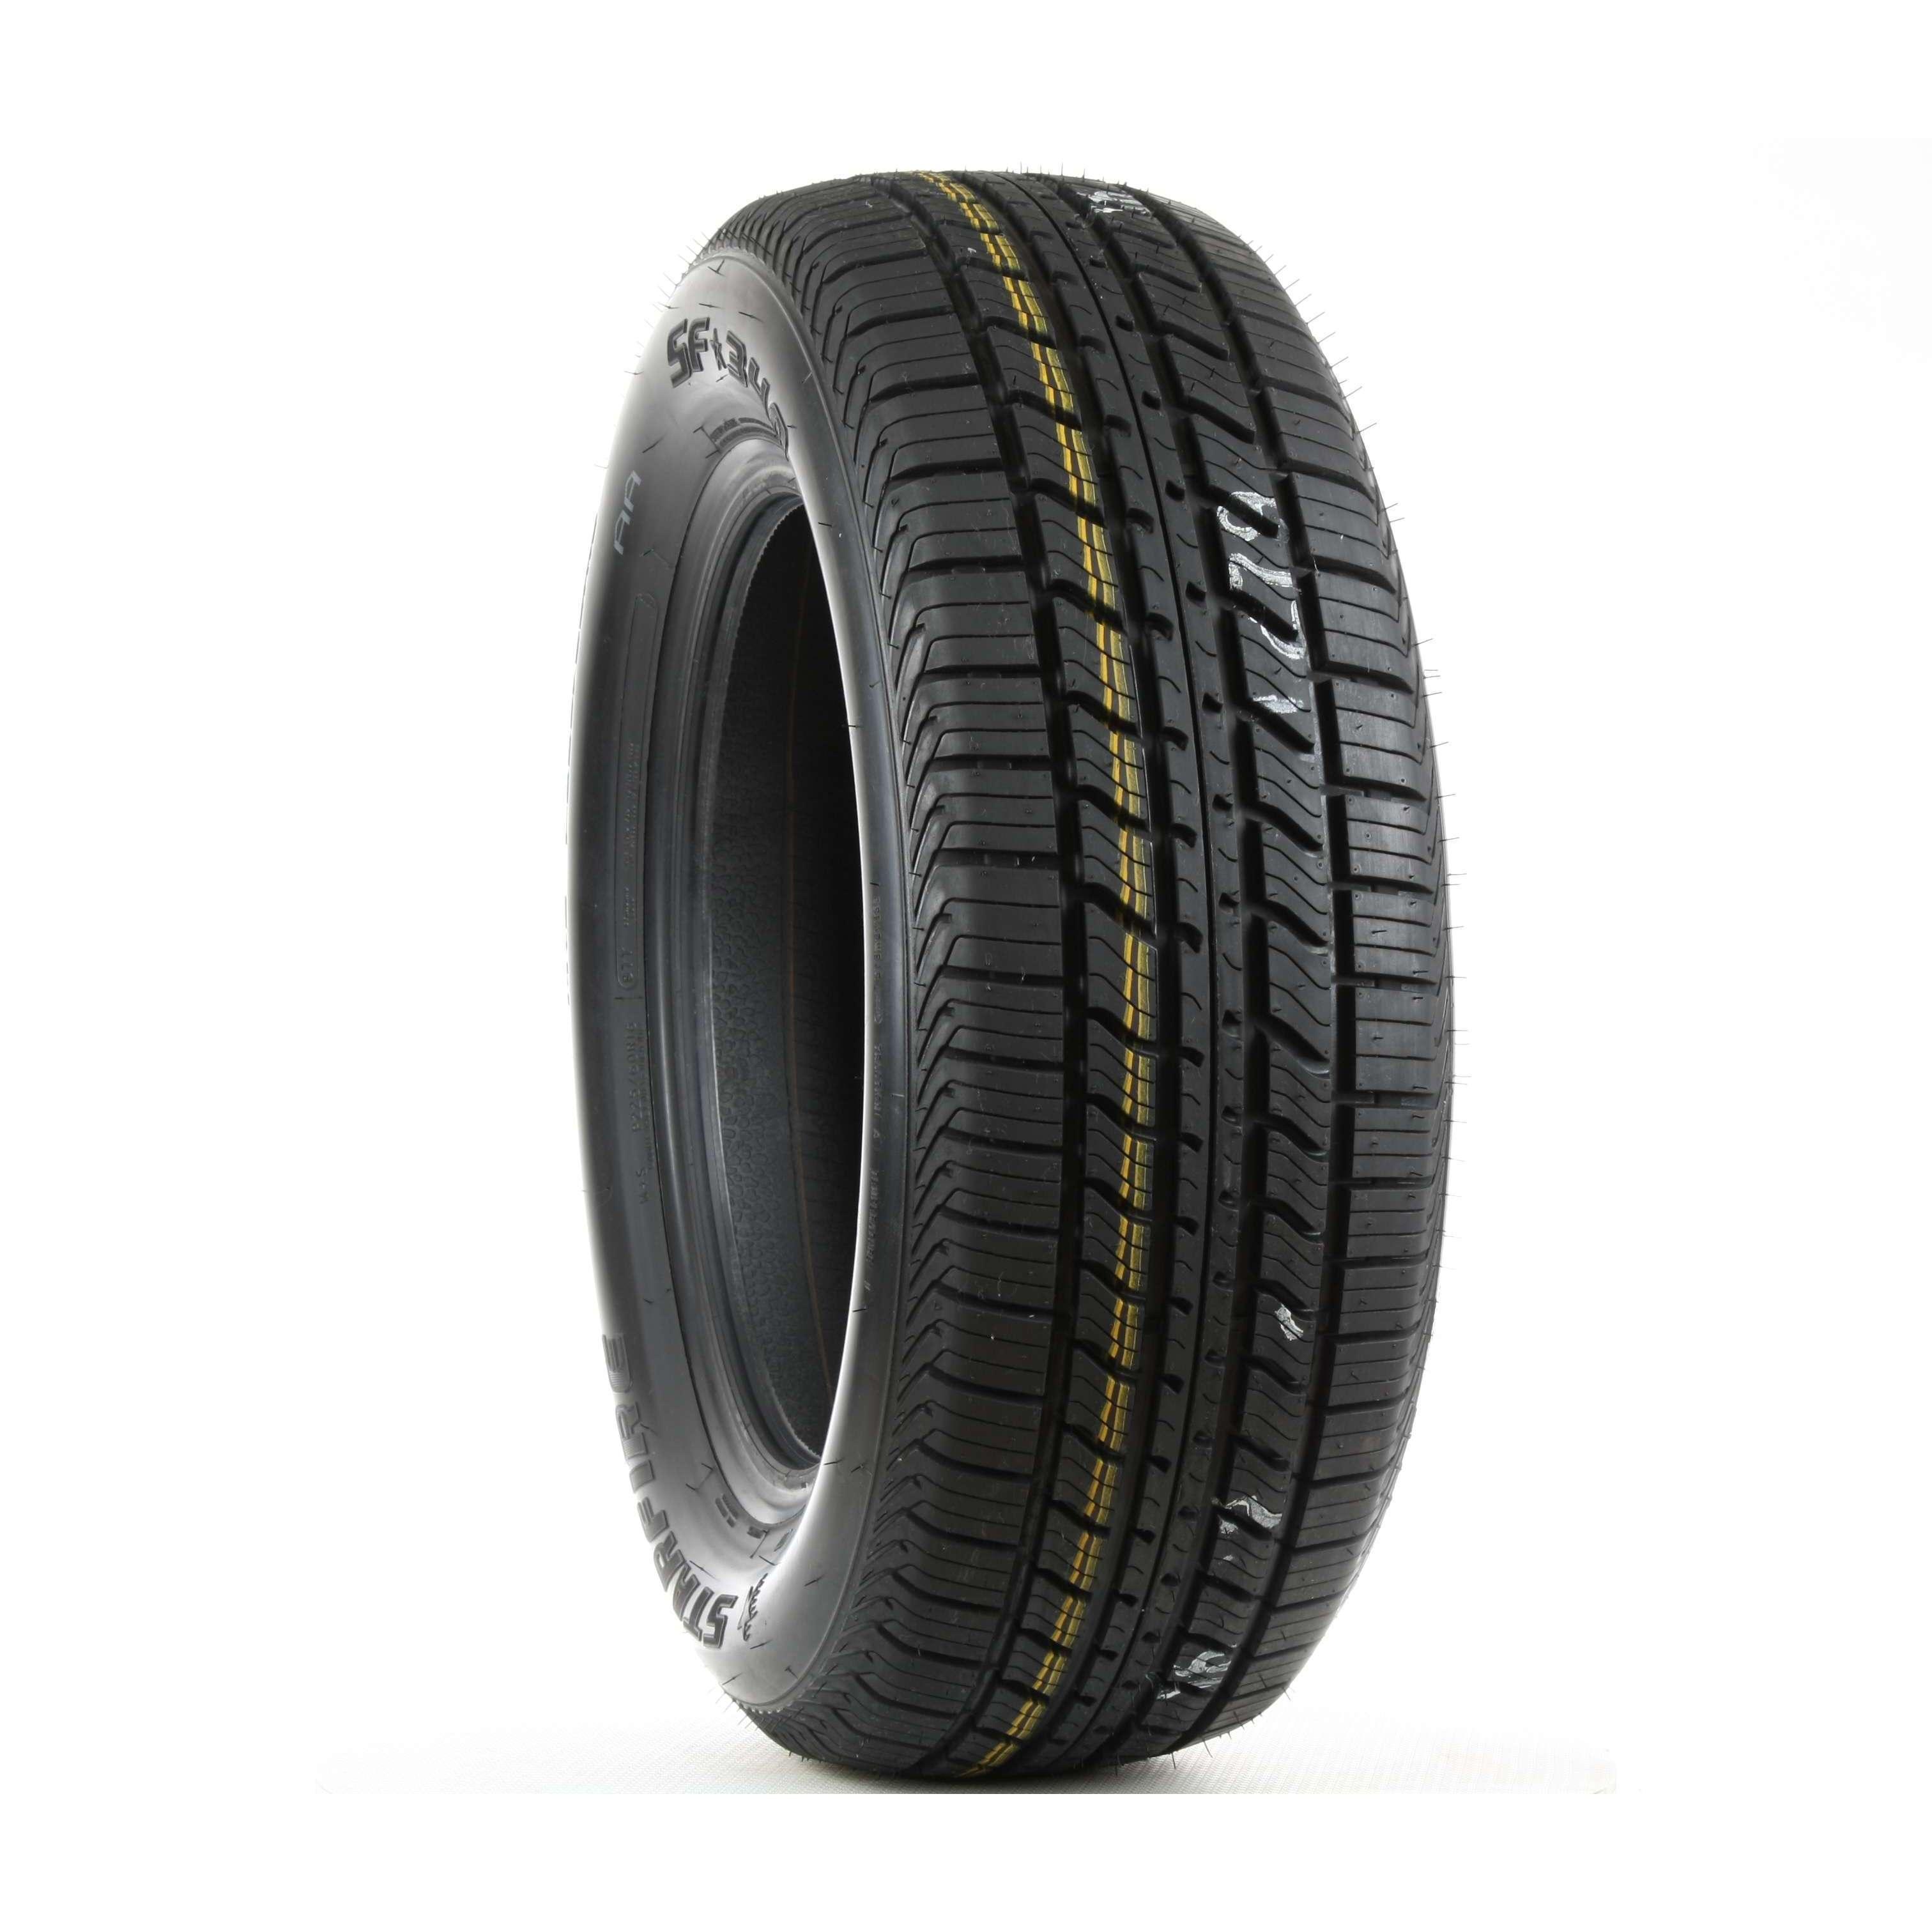 Starfire SF-340 All Season Tire - 225/60R16 97T (Black)